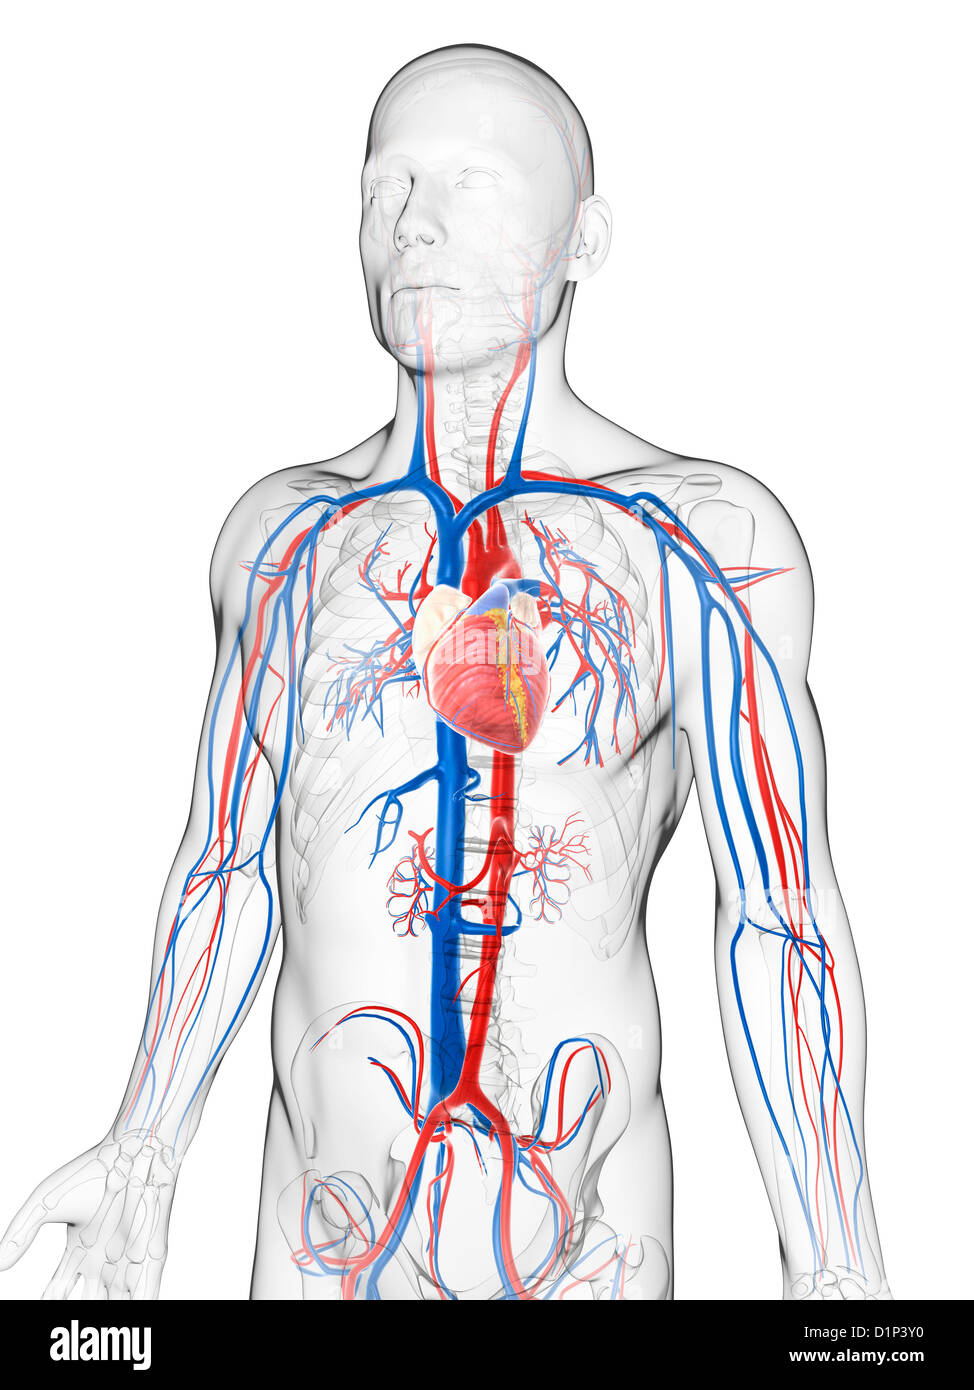 Heart Network Stockfotos & Heart Network Bilder - Seite 2 - Alamy